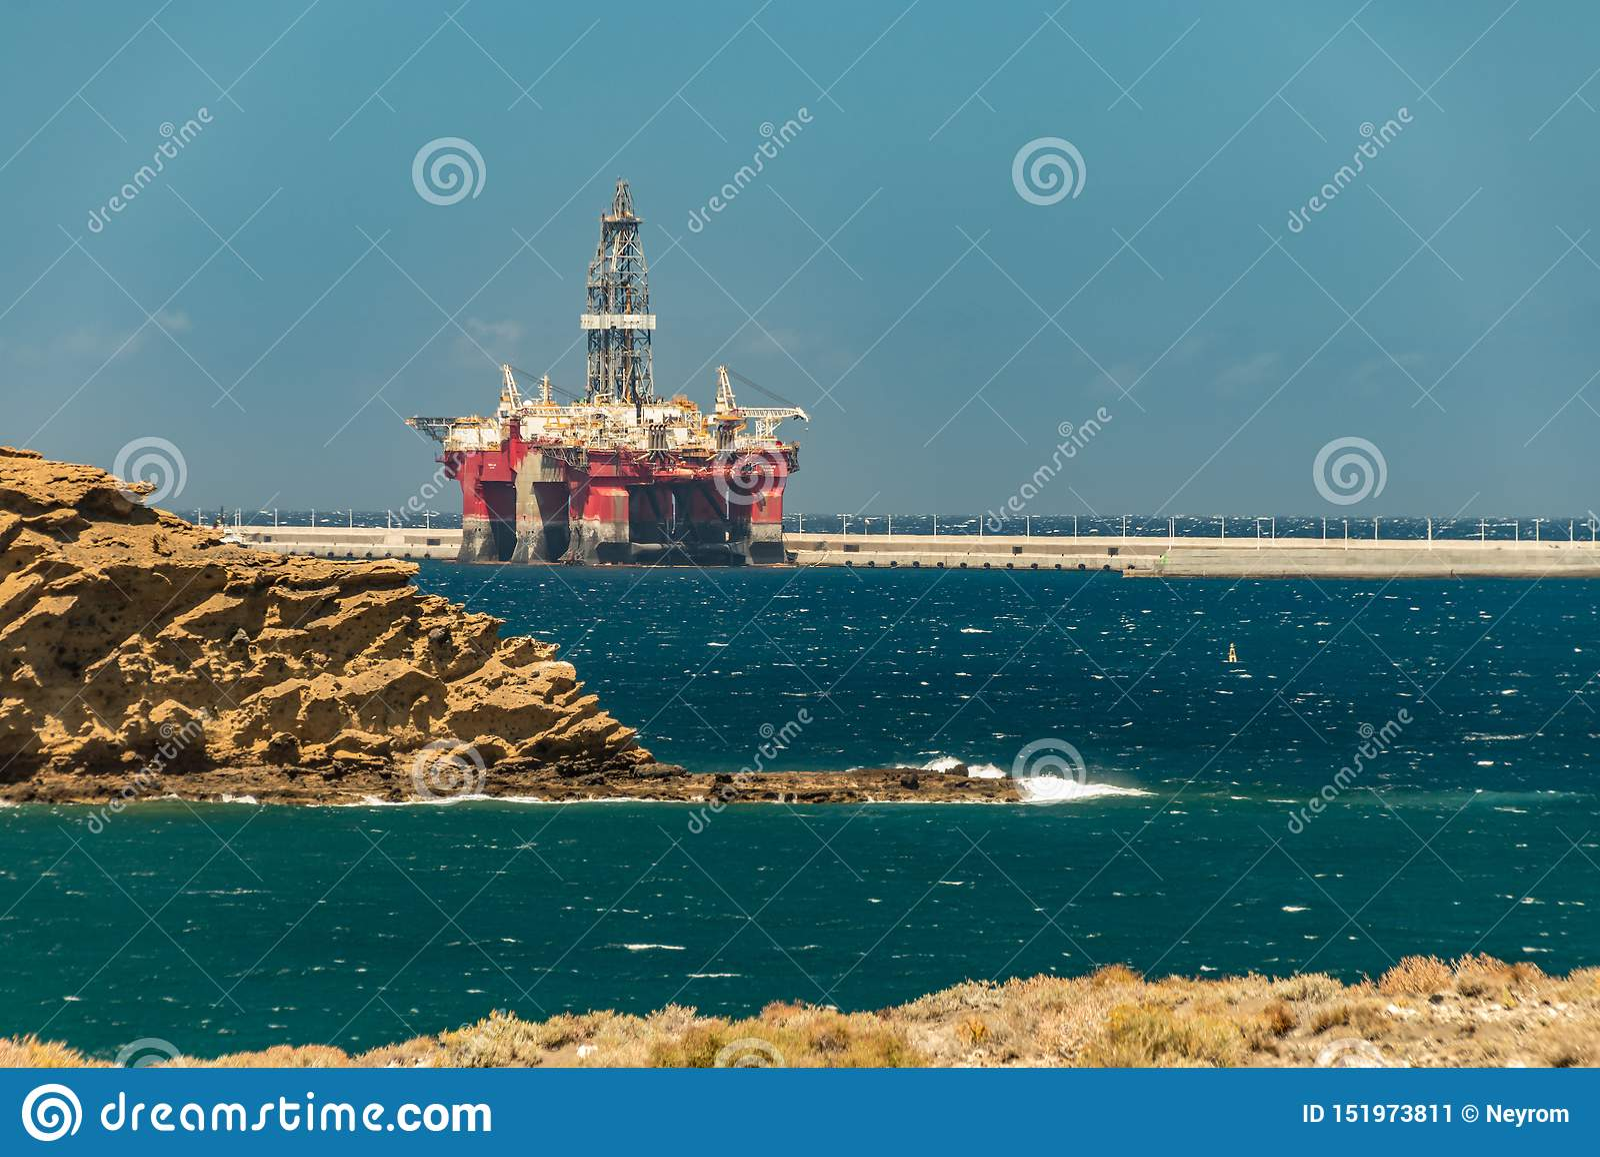 Взгляд от побережья снаряжения масла оффшорного причаленного в порте Granadilla на Тенерифе